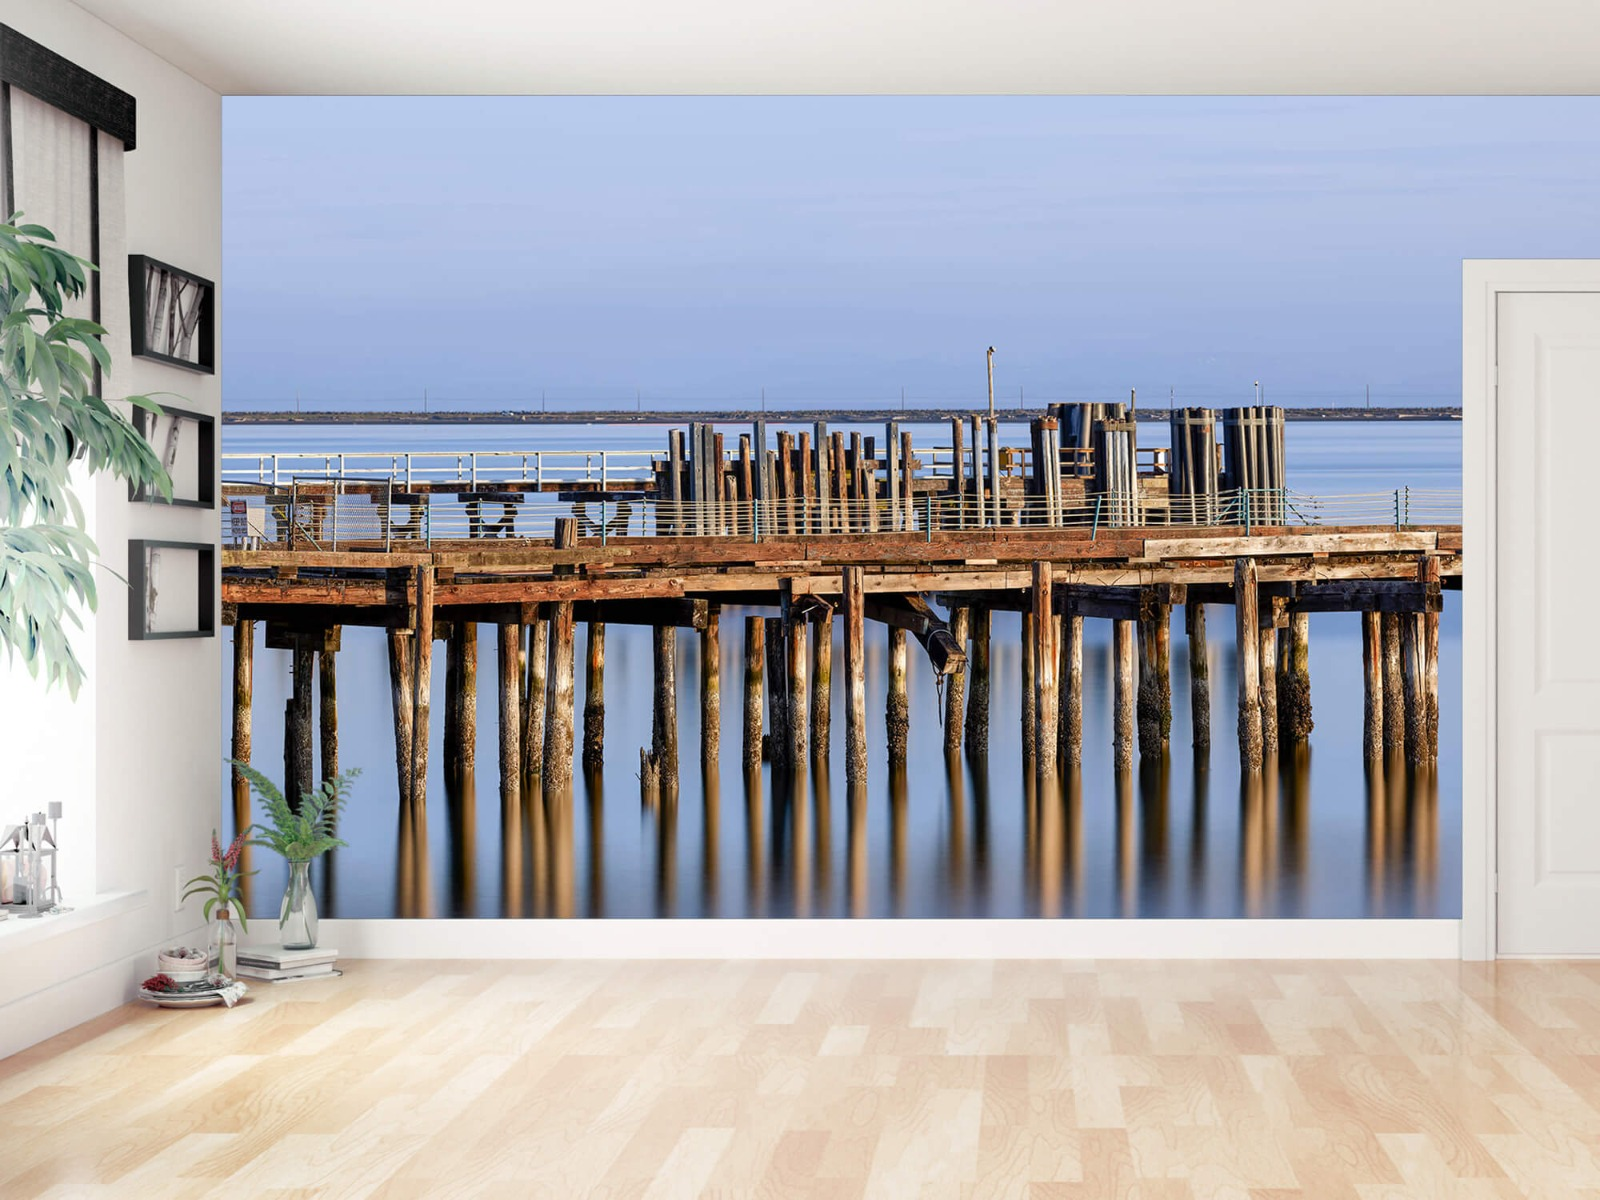 Houten Steigers - Steiger op houten palen - Wallexclusive - Slaapkamer 12